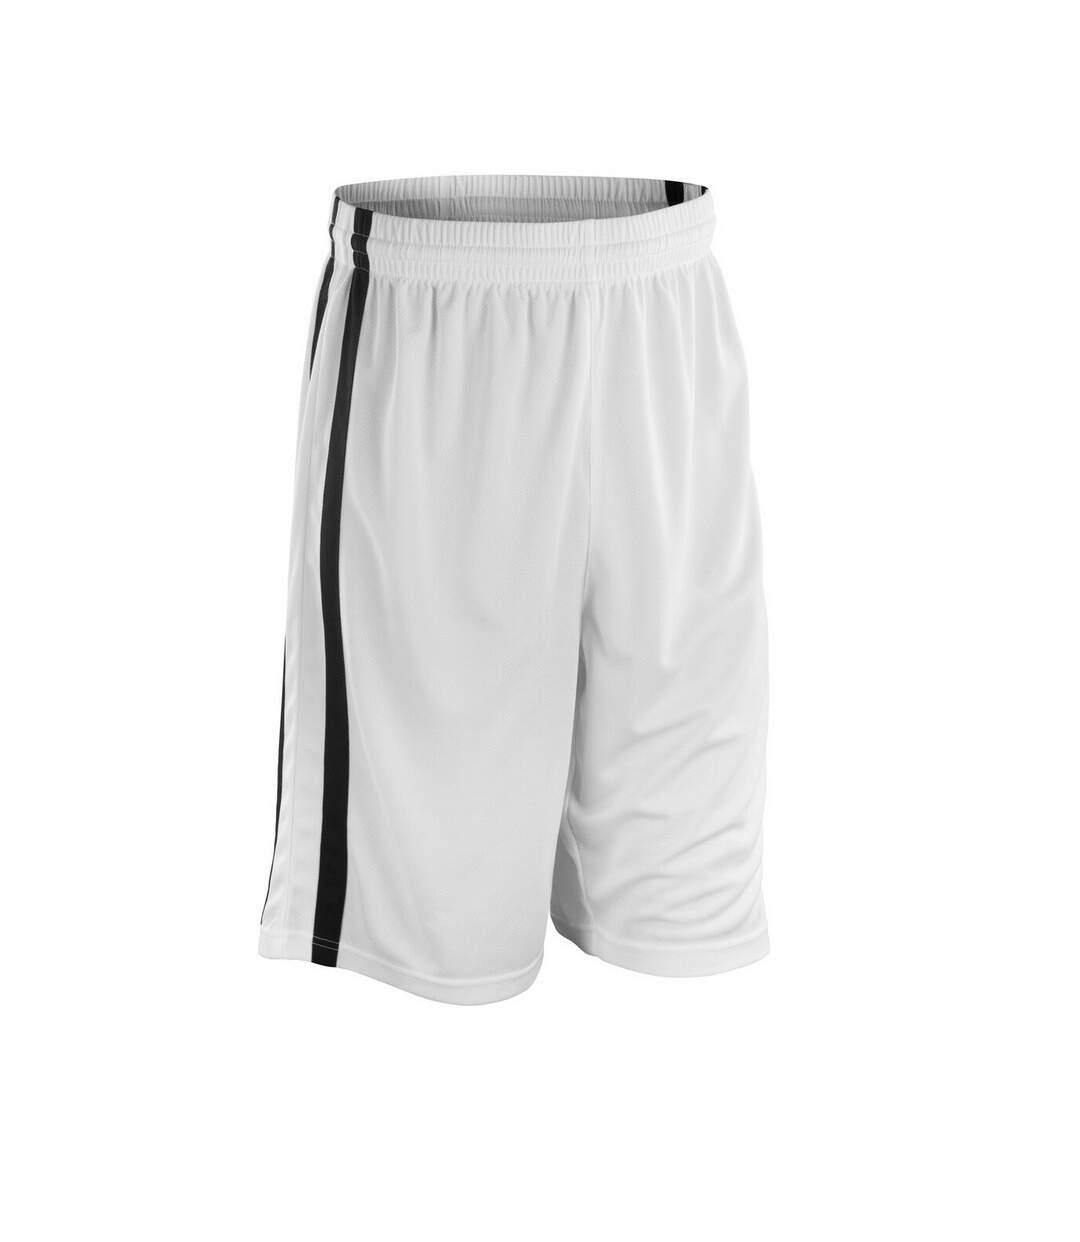 Spiro Mens Quick Dry Basketball Shorts (Red/White) - UTRW4779